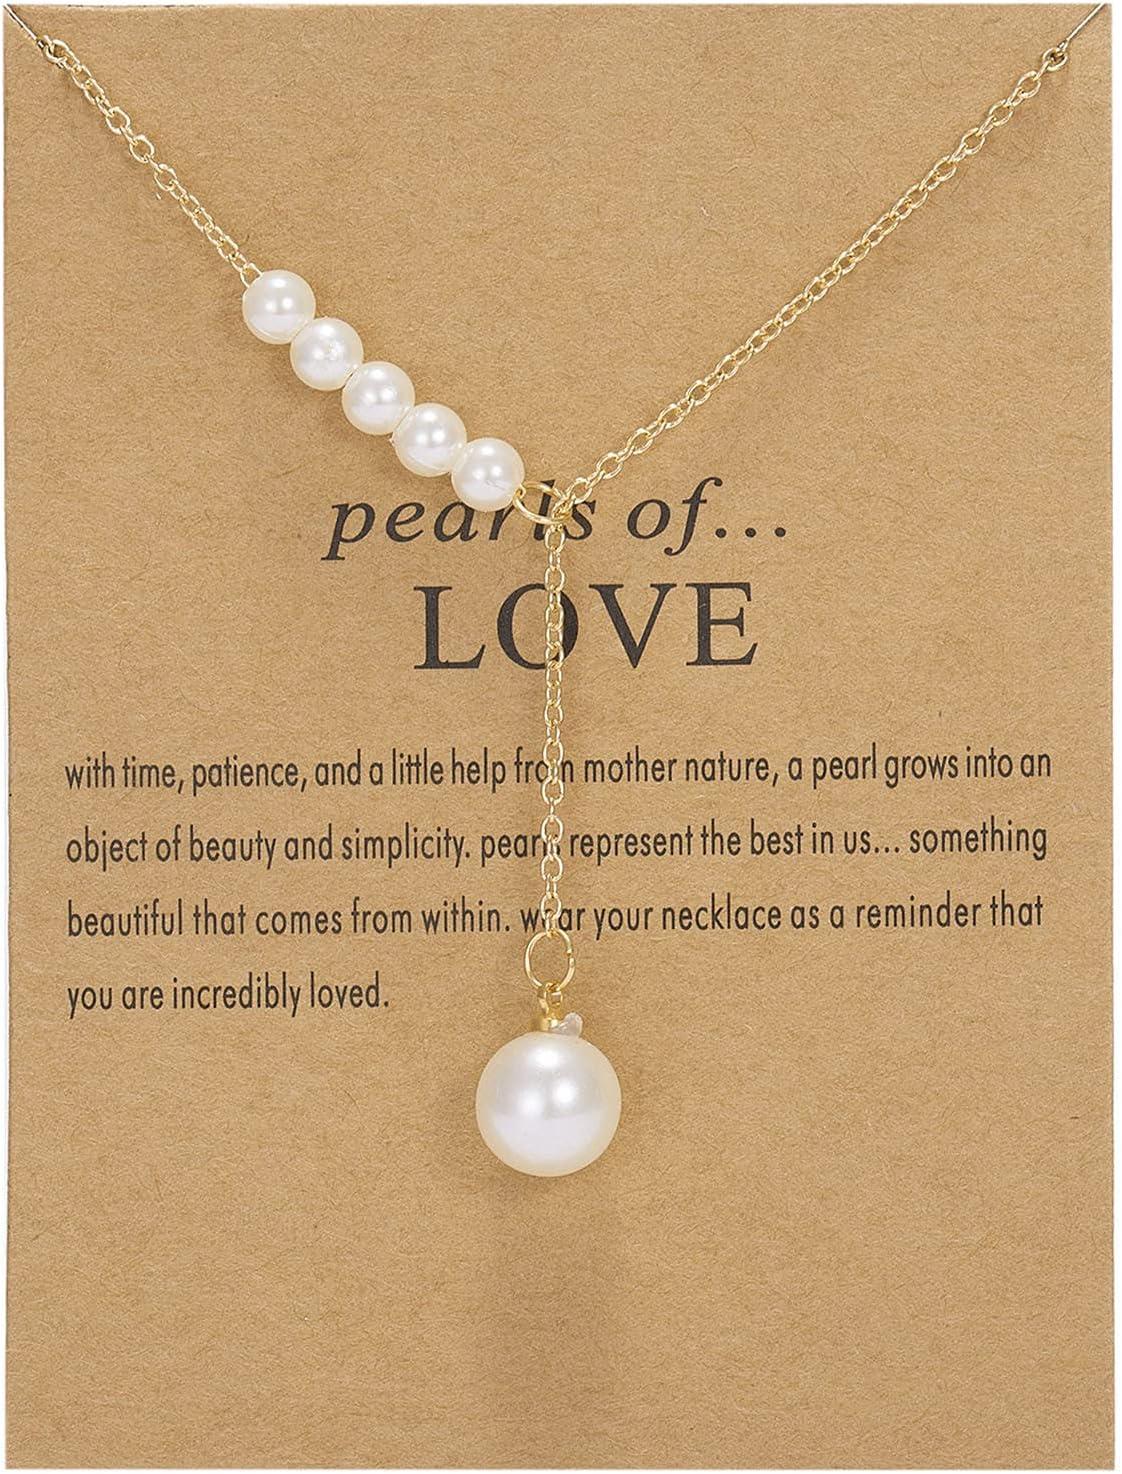 sfdeggtb Gold Necklaces for Women Friendship Necklaces Paper Card Necklaces Clavicle Necklaces Adjustable Moon Flower Pendant Chain Necklace (B)